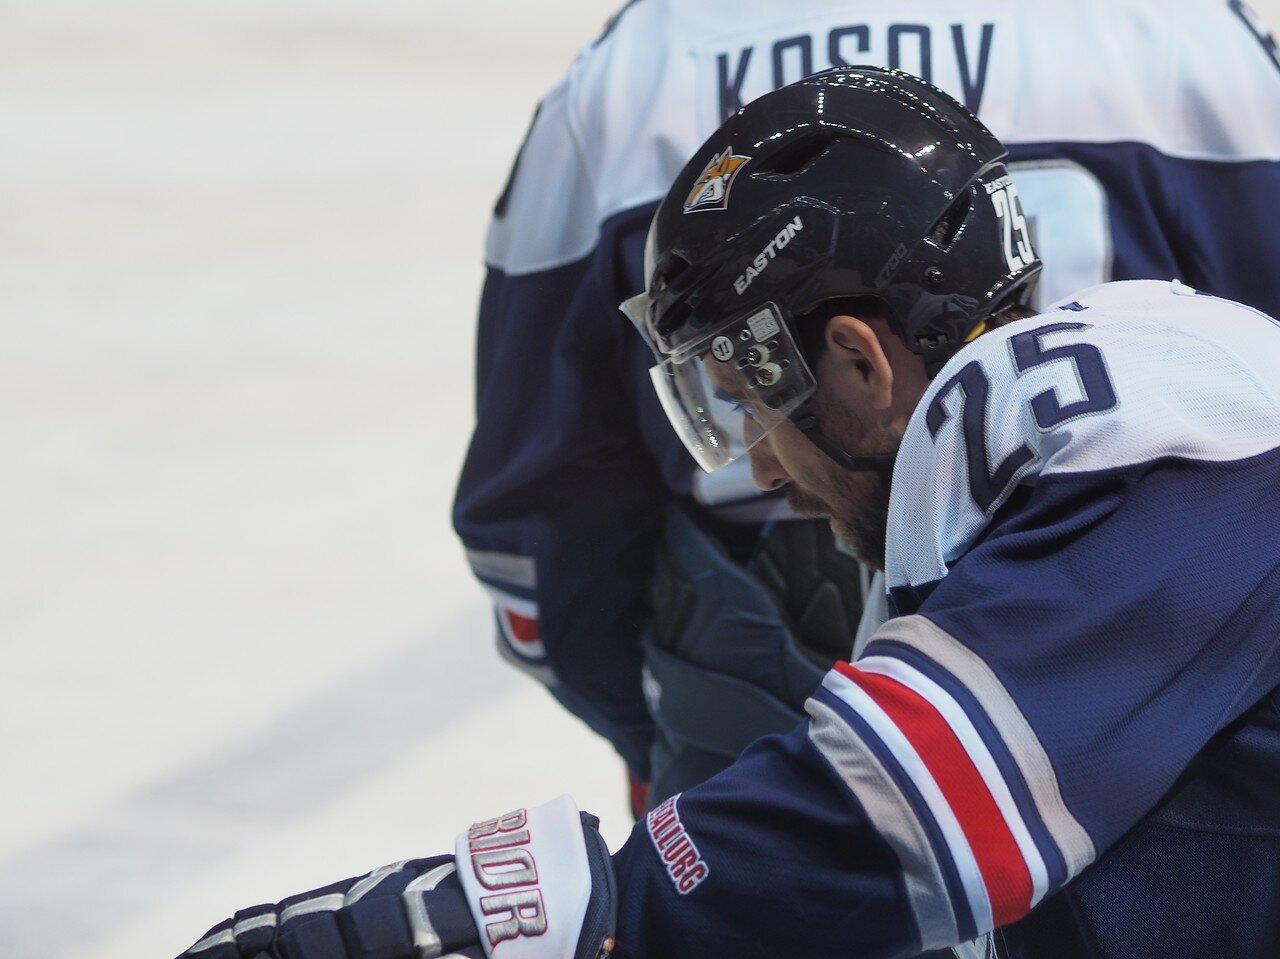 22Плей-офф 2016 Восток 1/2 Металлург - Сибирь 10.03.2016